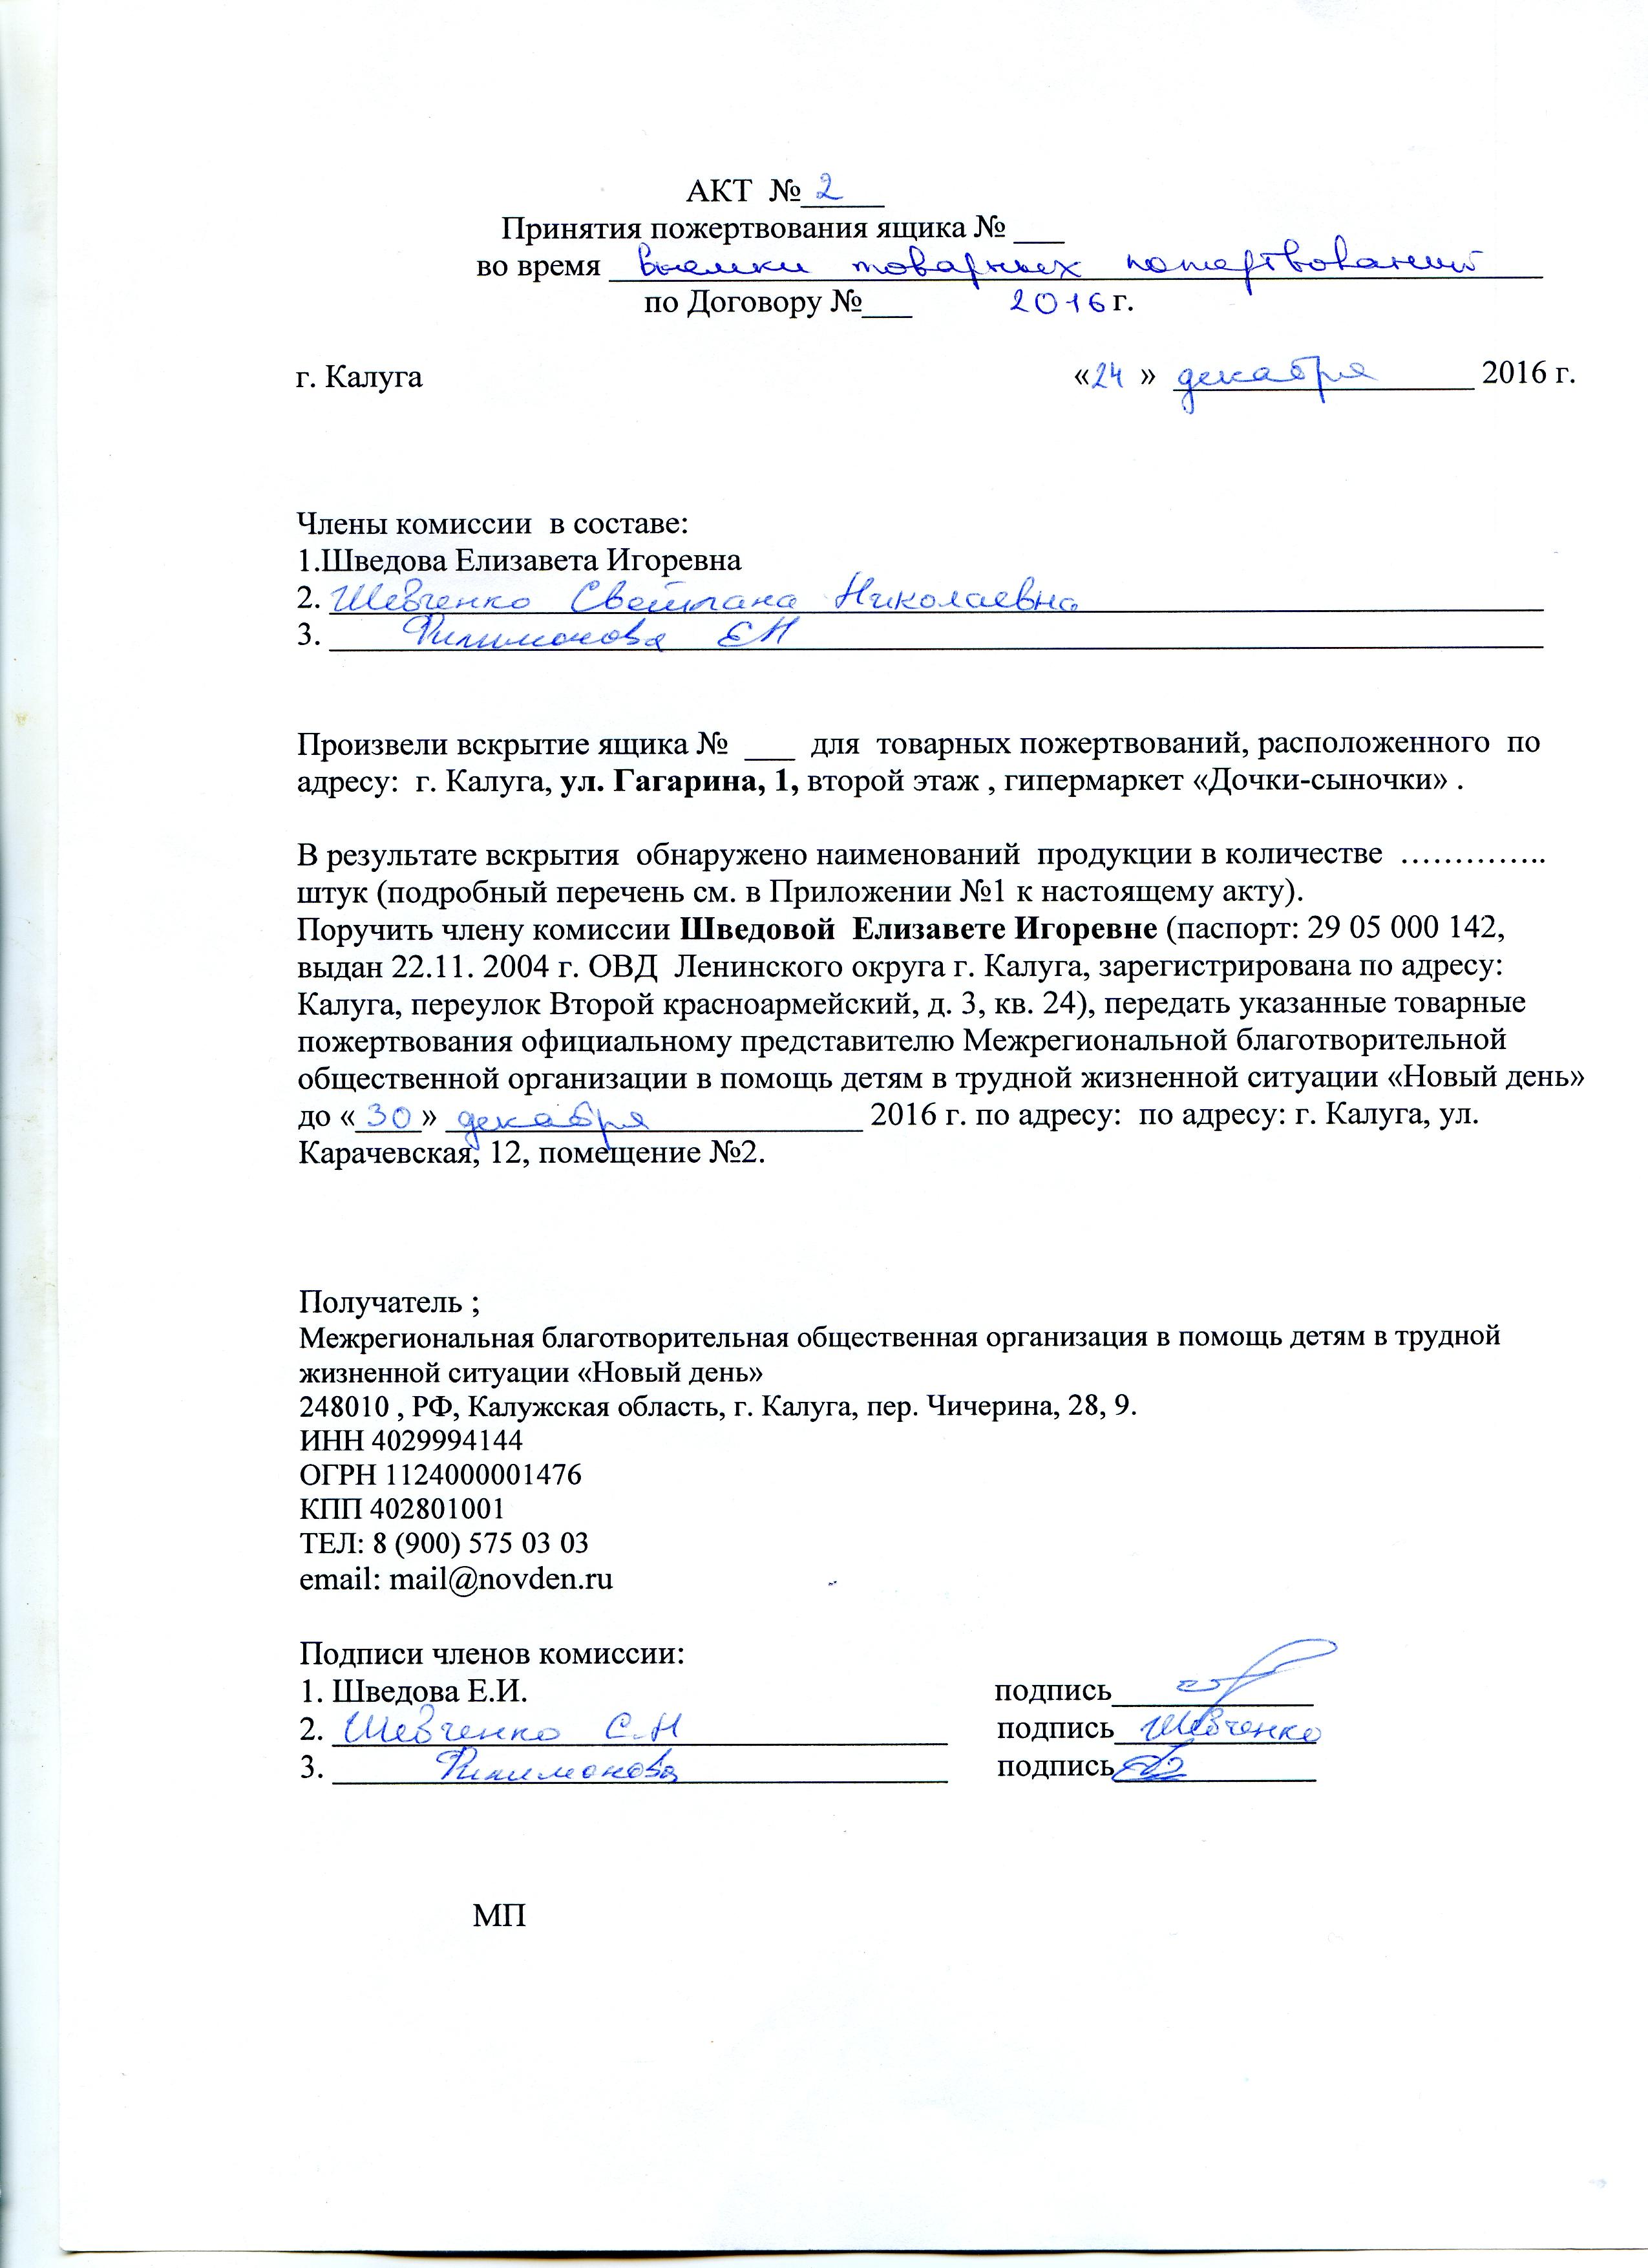 Акт 2 Гагарина 24 декабря 2016295